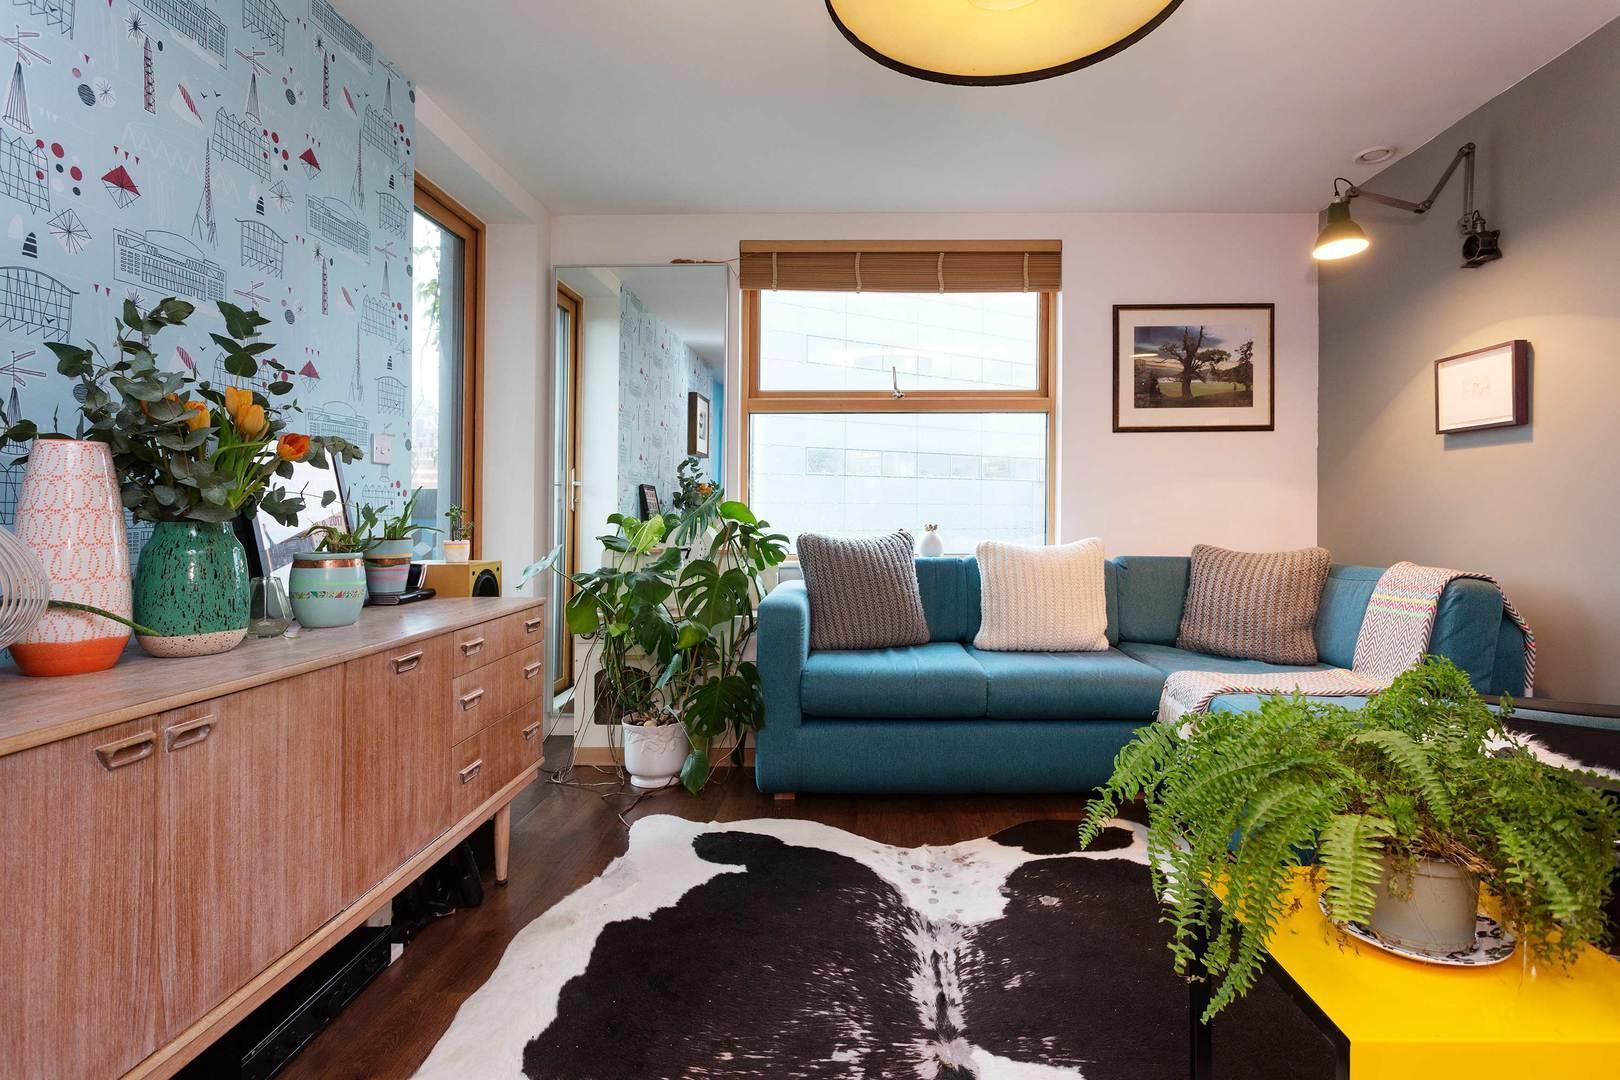 City View Apartment London Reviews